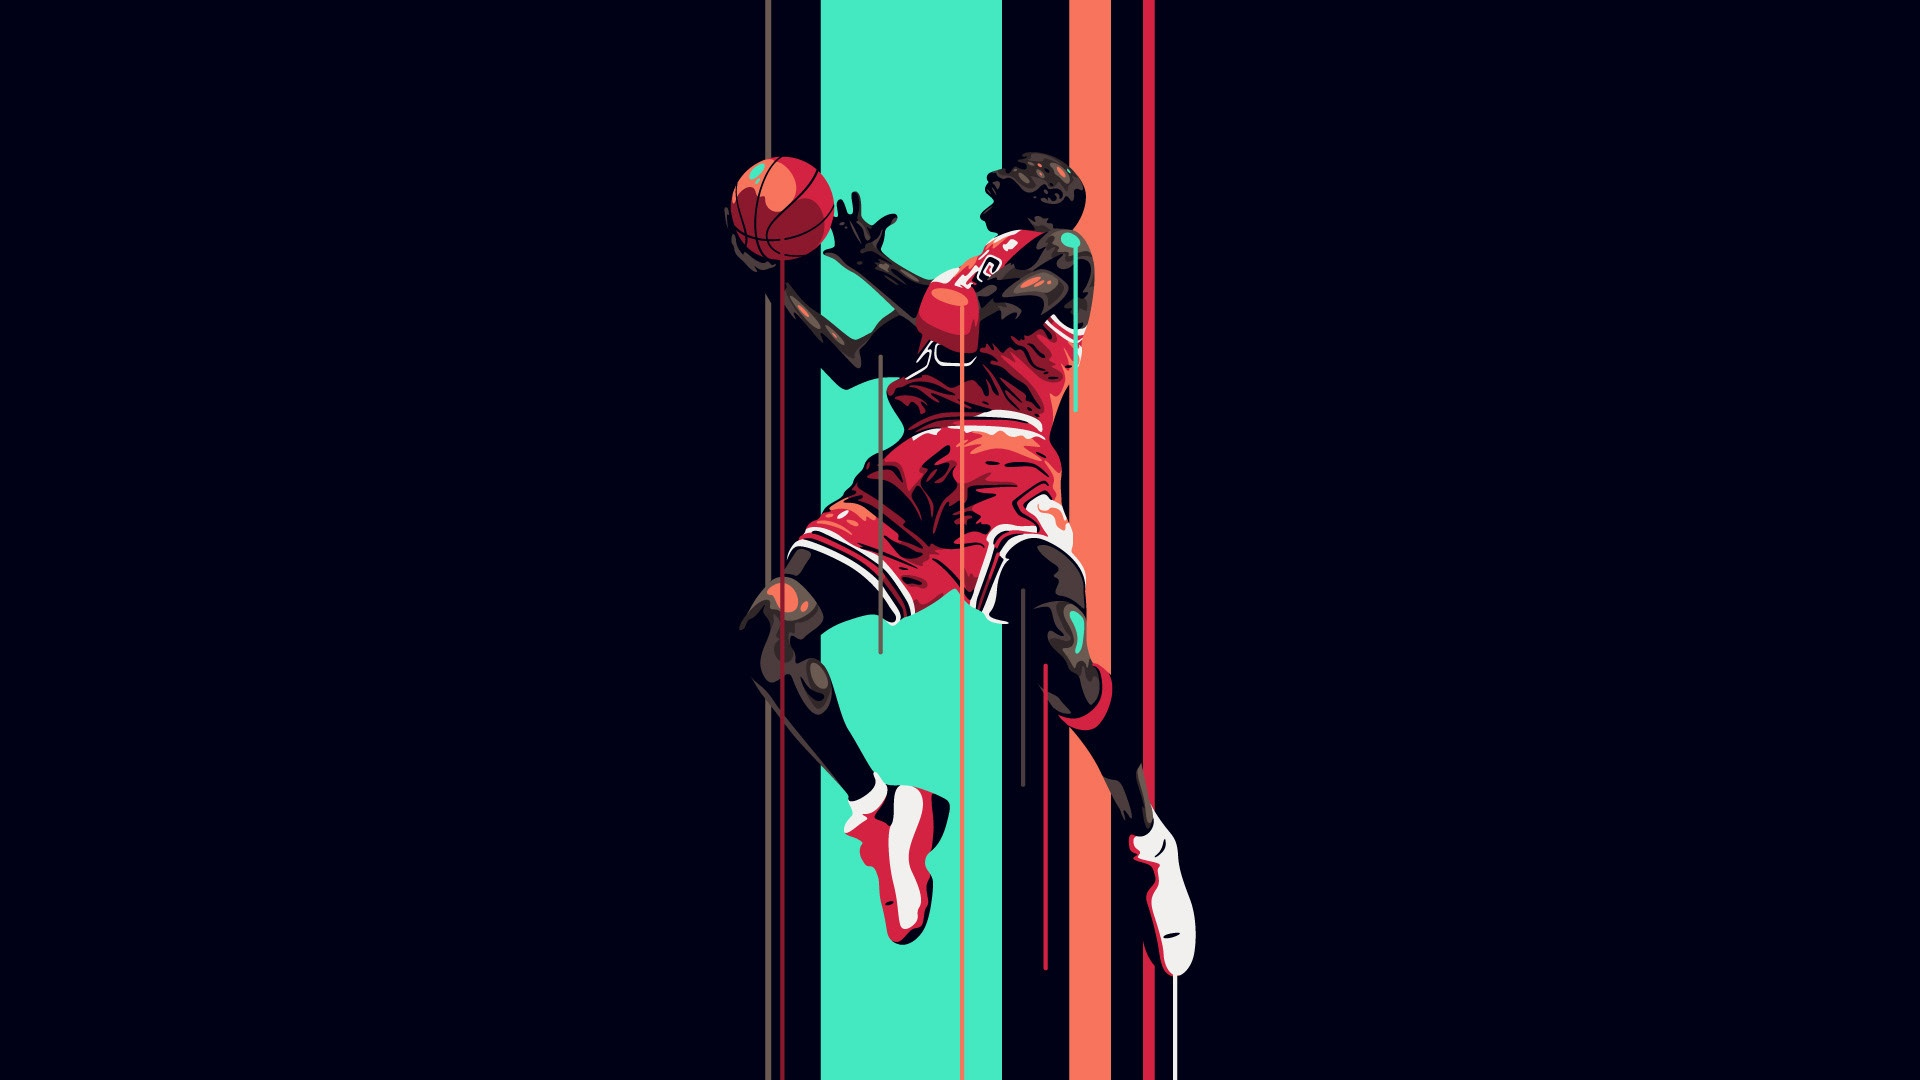 Michael Jordan desktop background